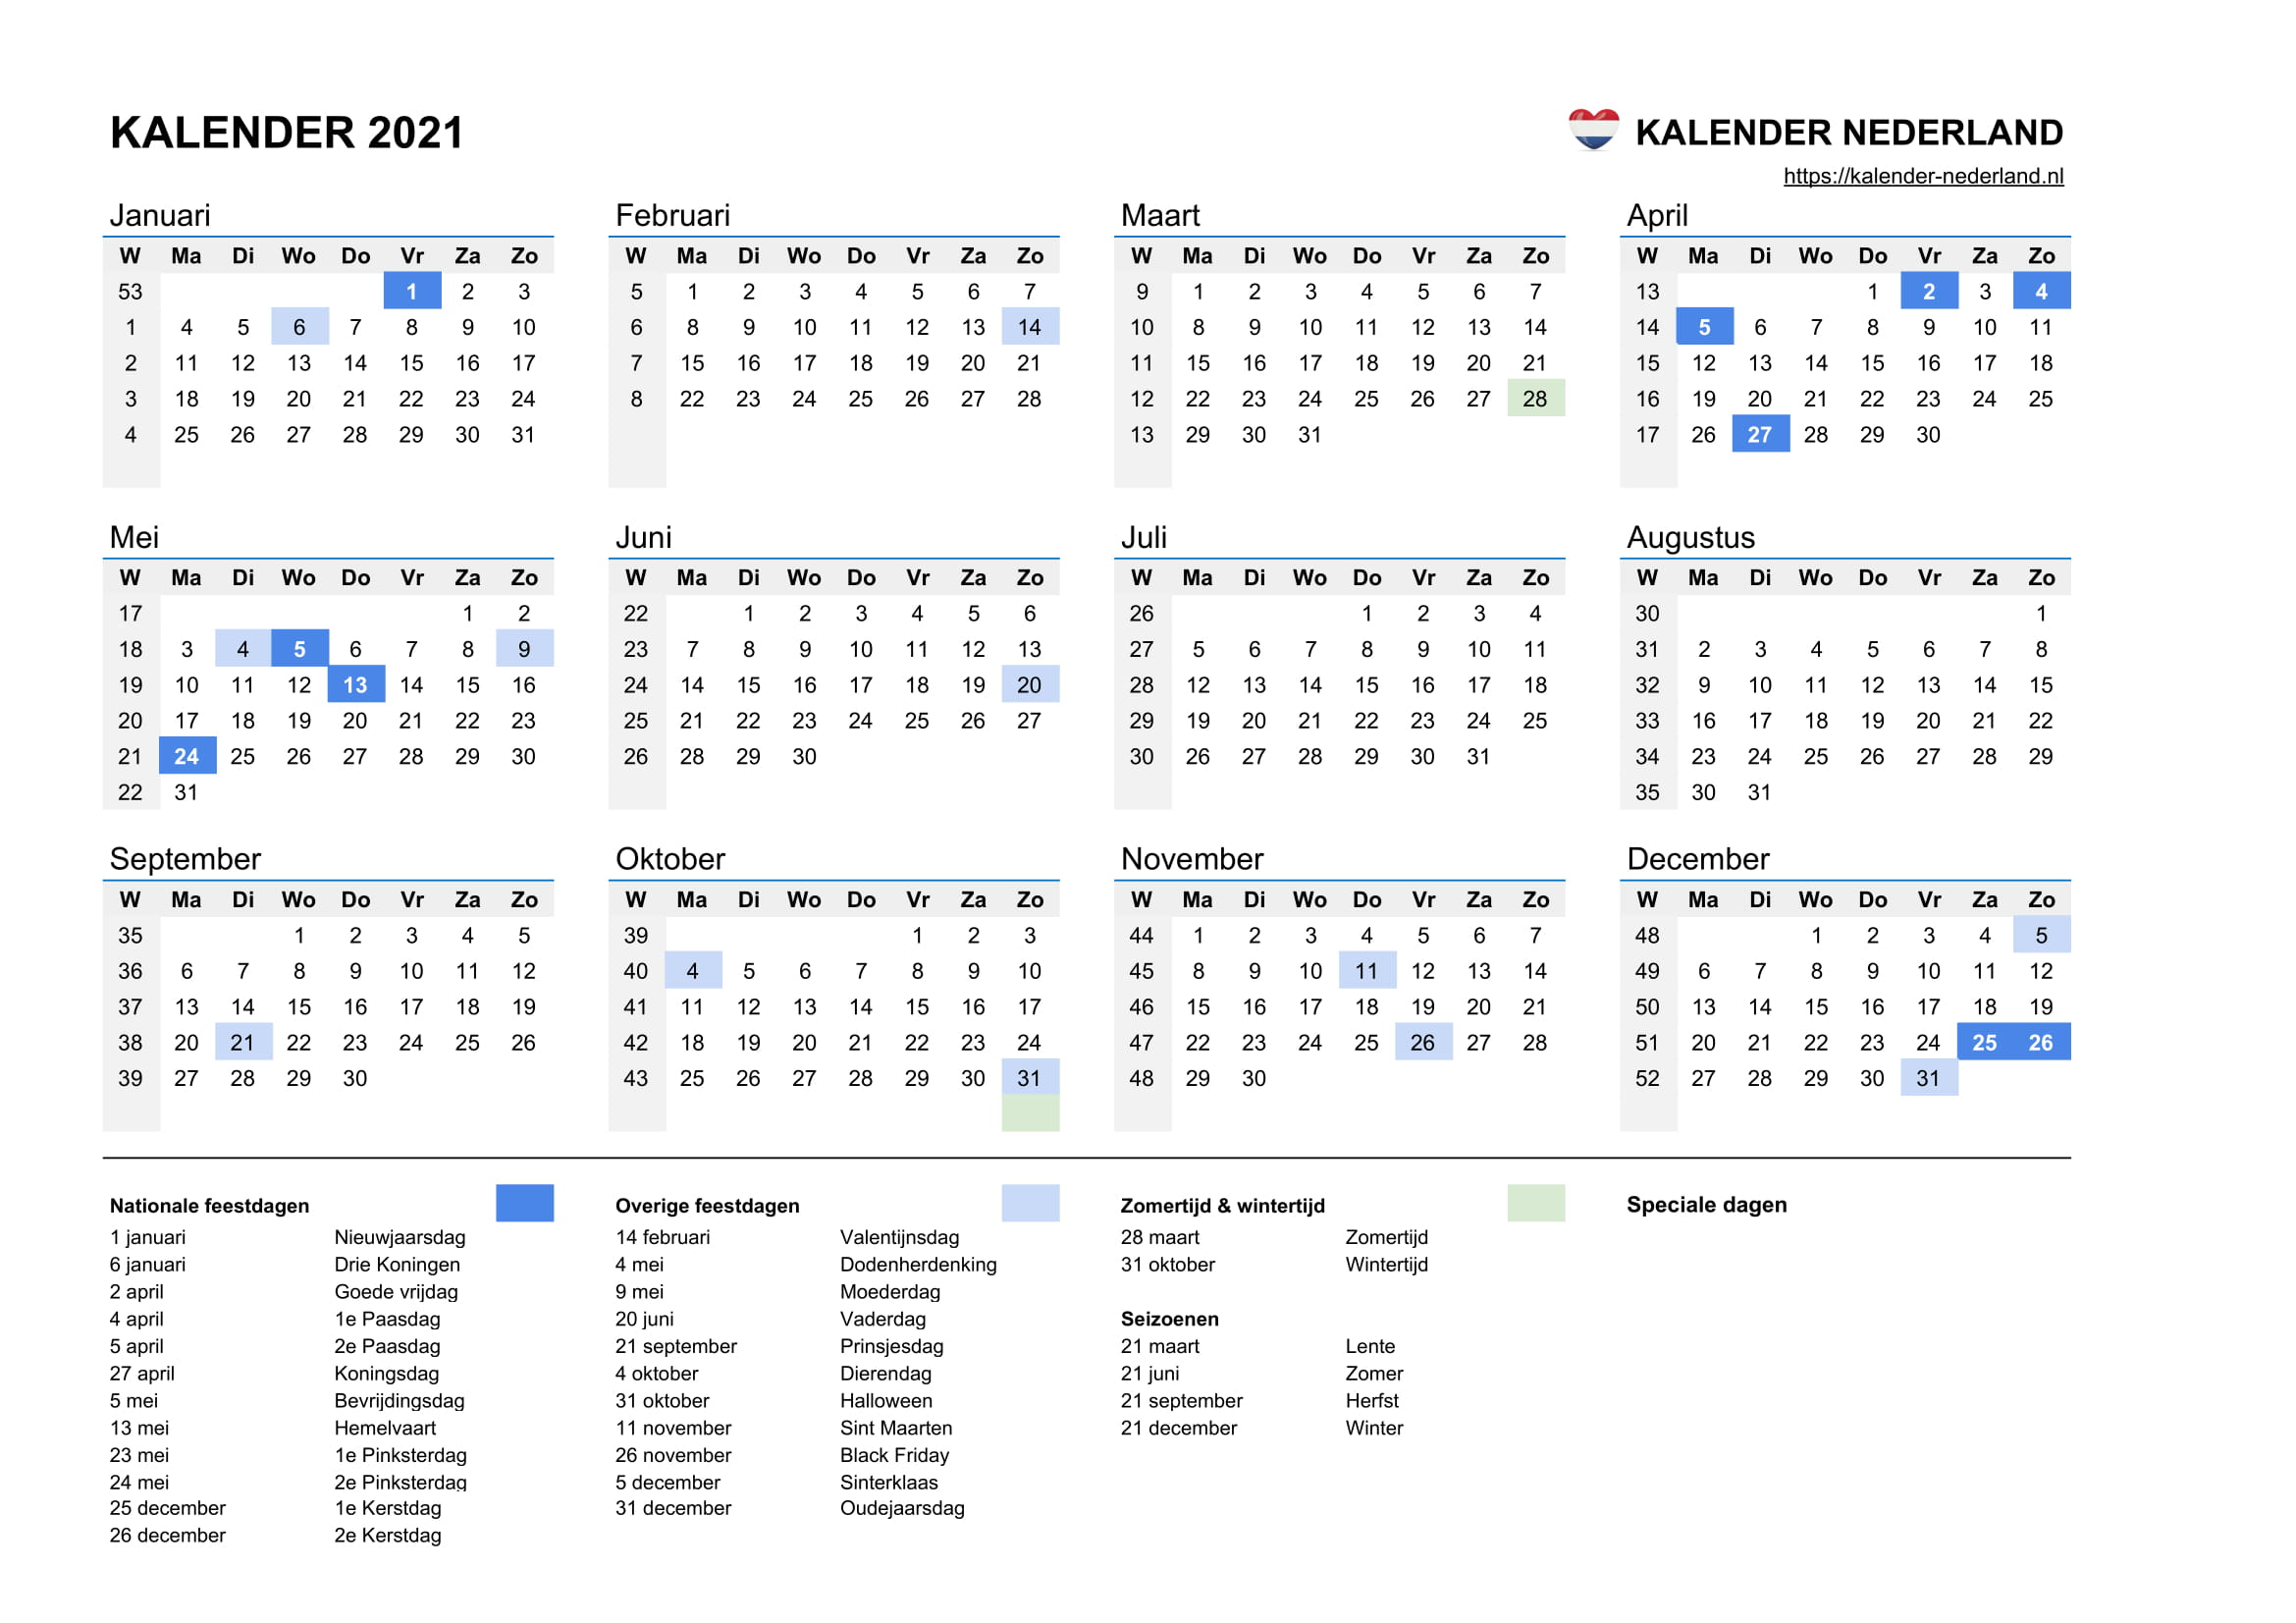 Kalender-2021.jpg (2339×1653)